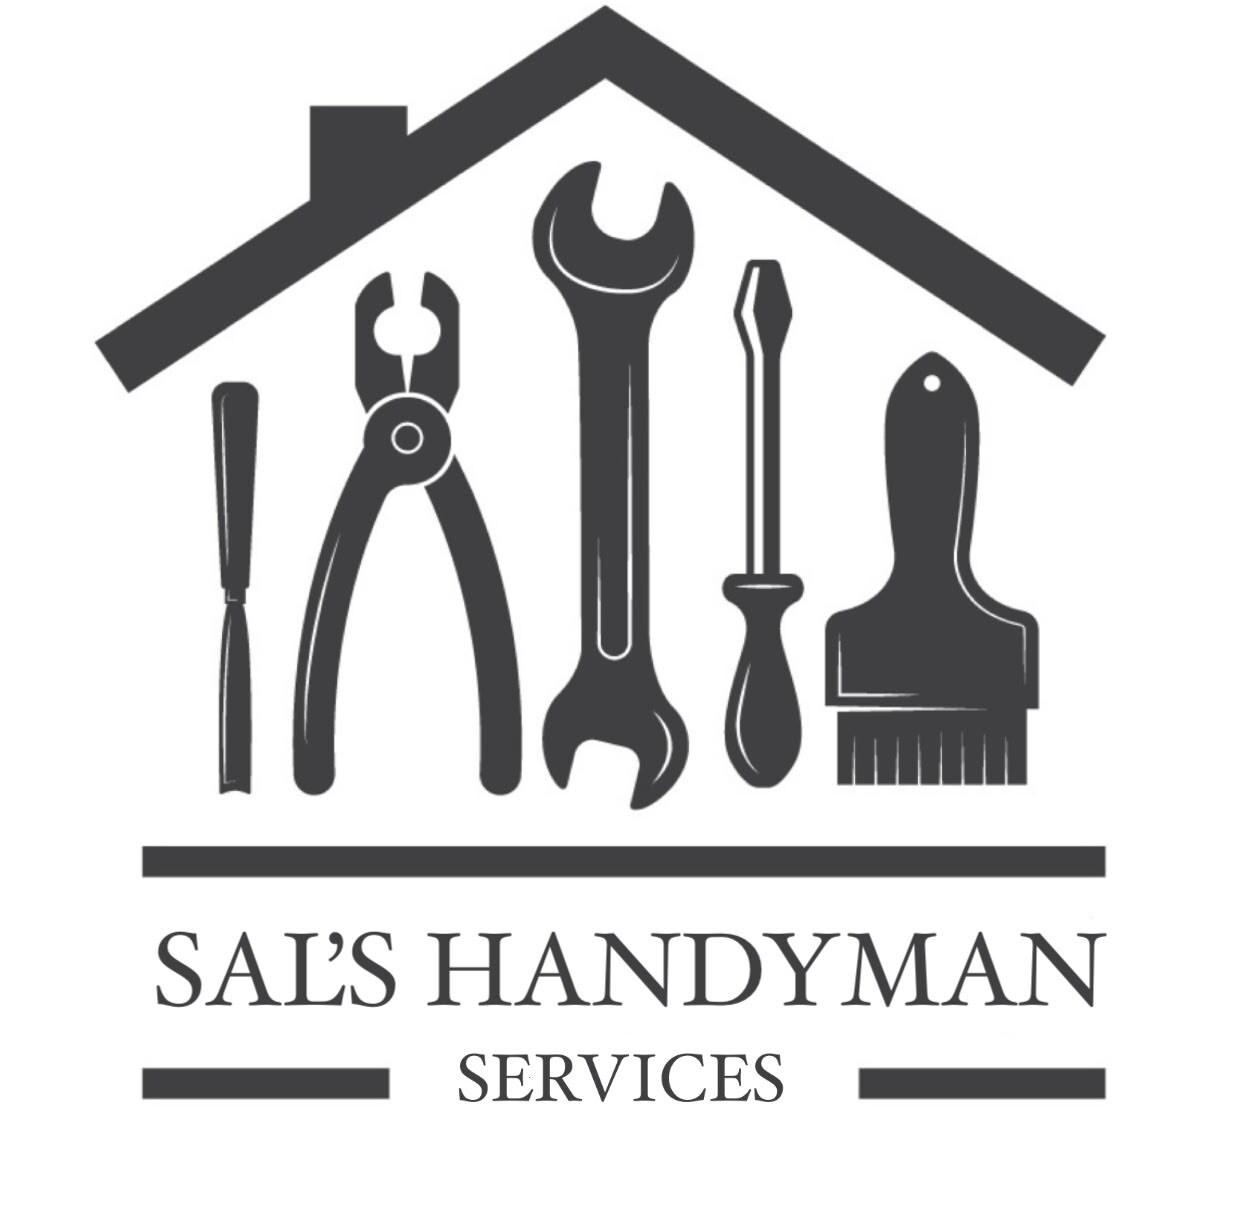 Sal's Handyman Services logo